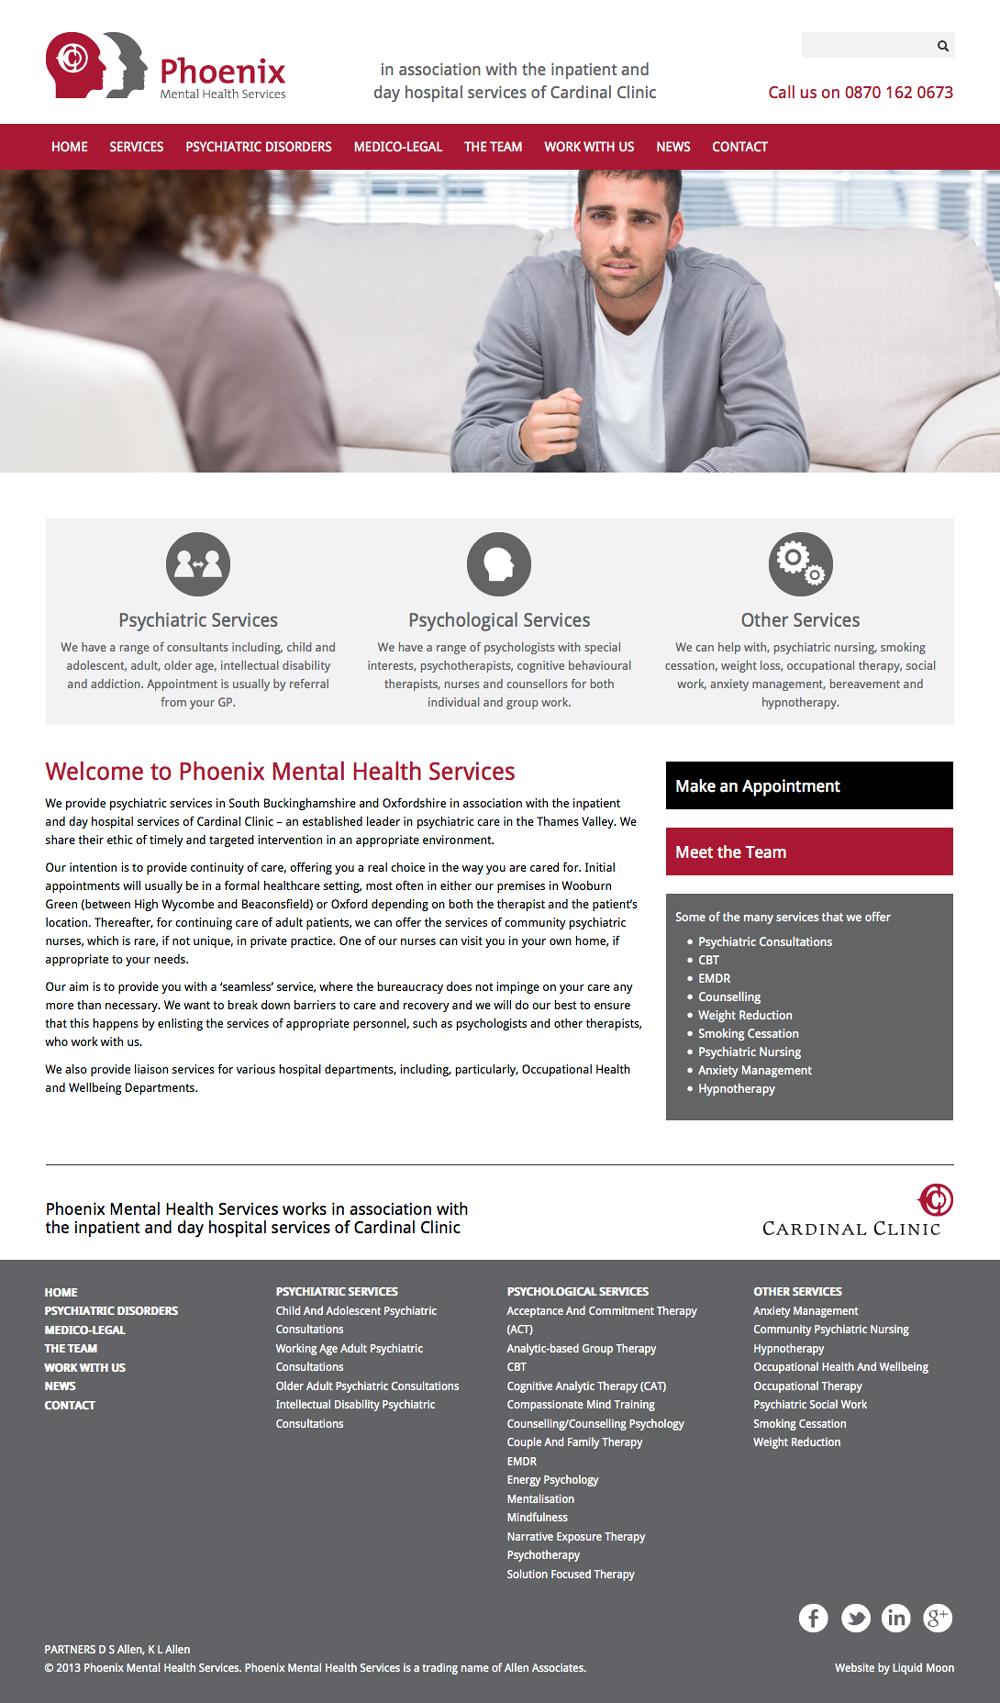 Phoenix Mental Health Services website